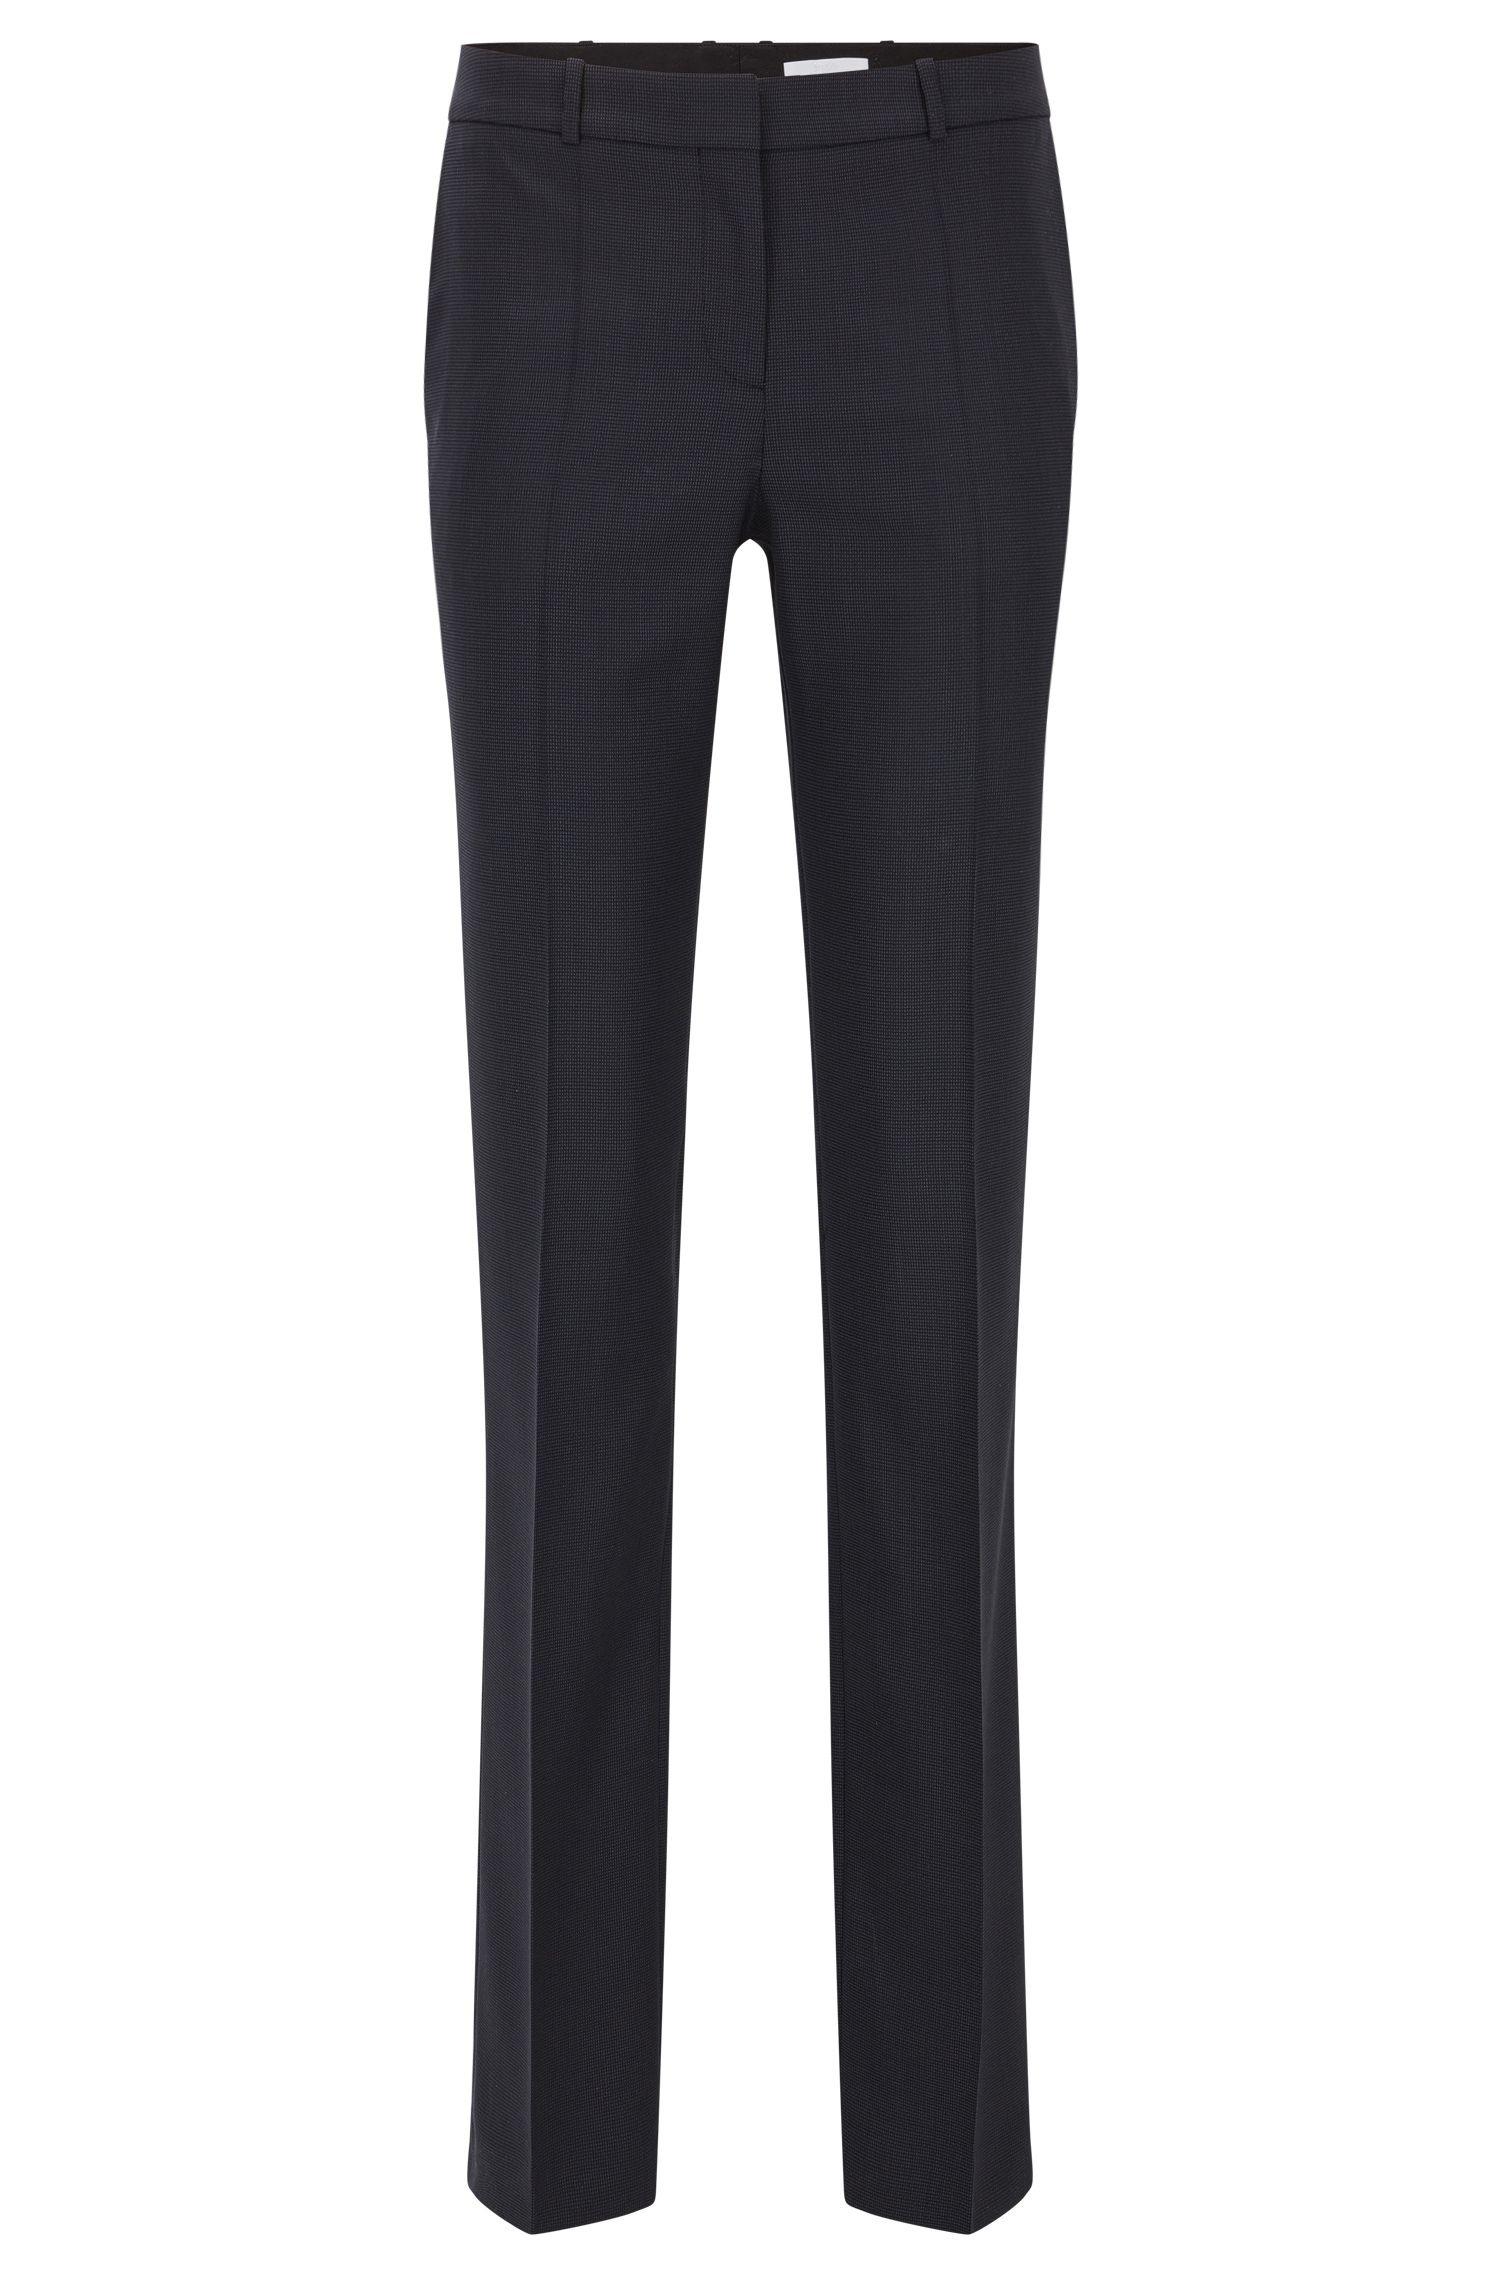 Pantaloni regular fit in lana vergine elasticizzata